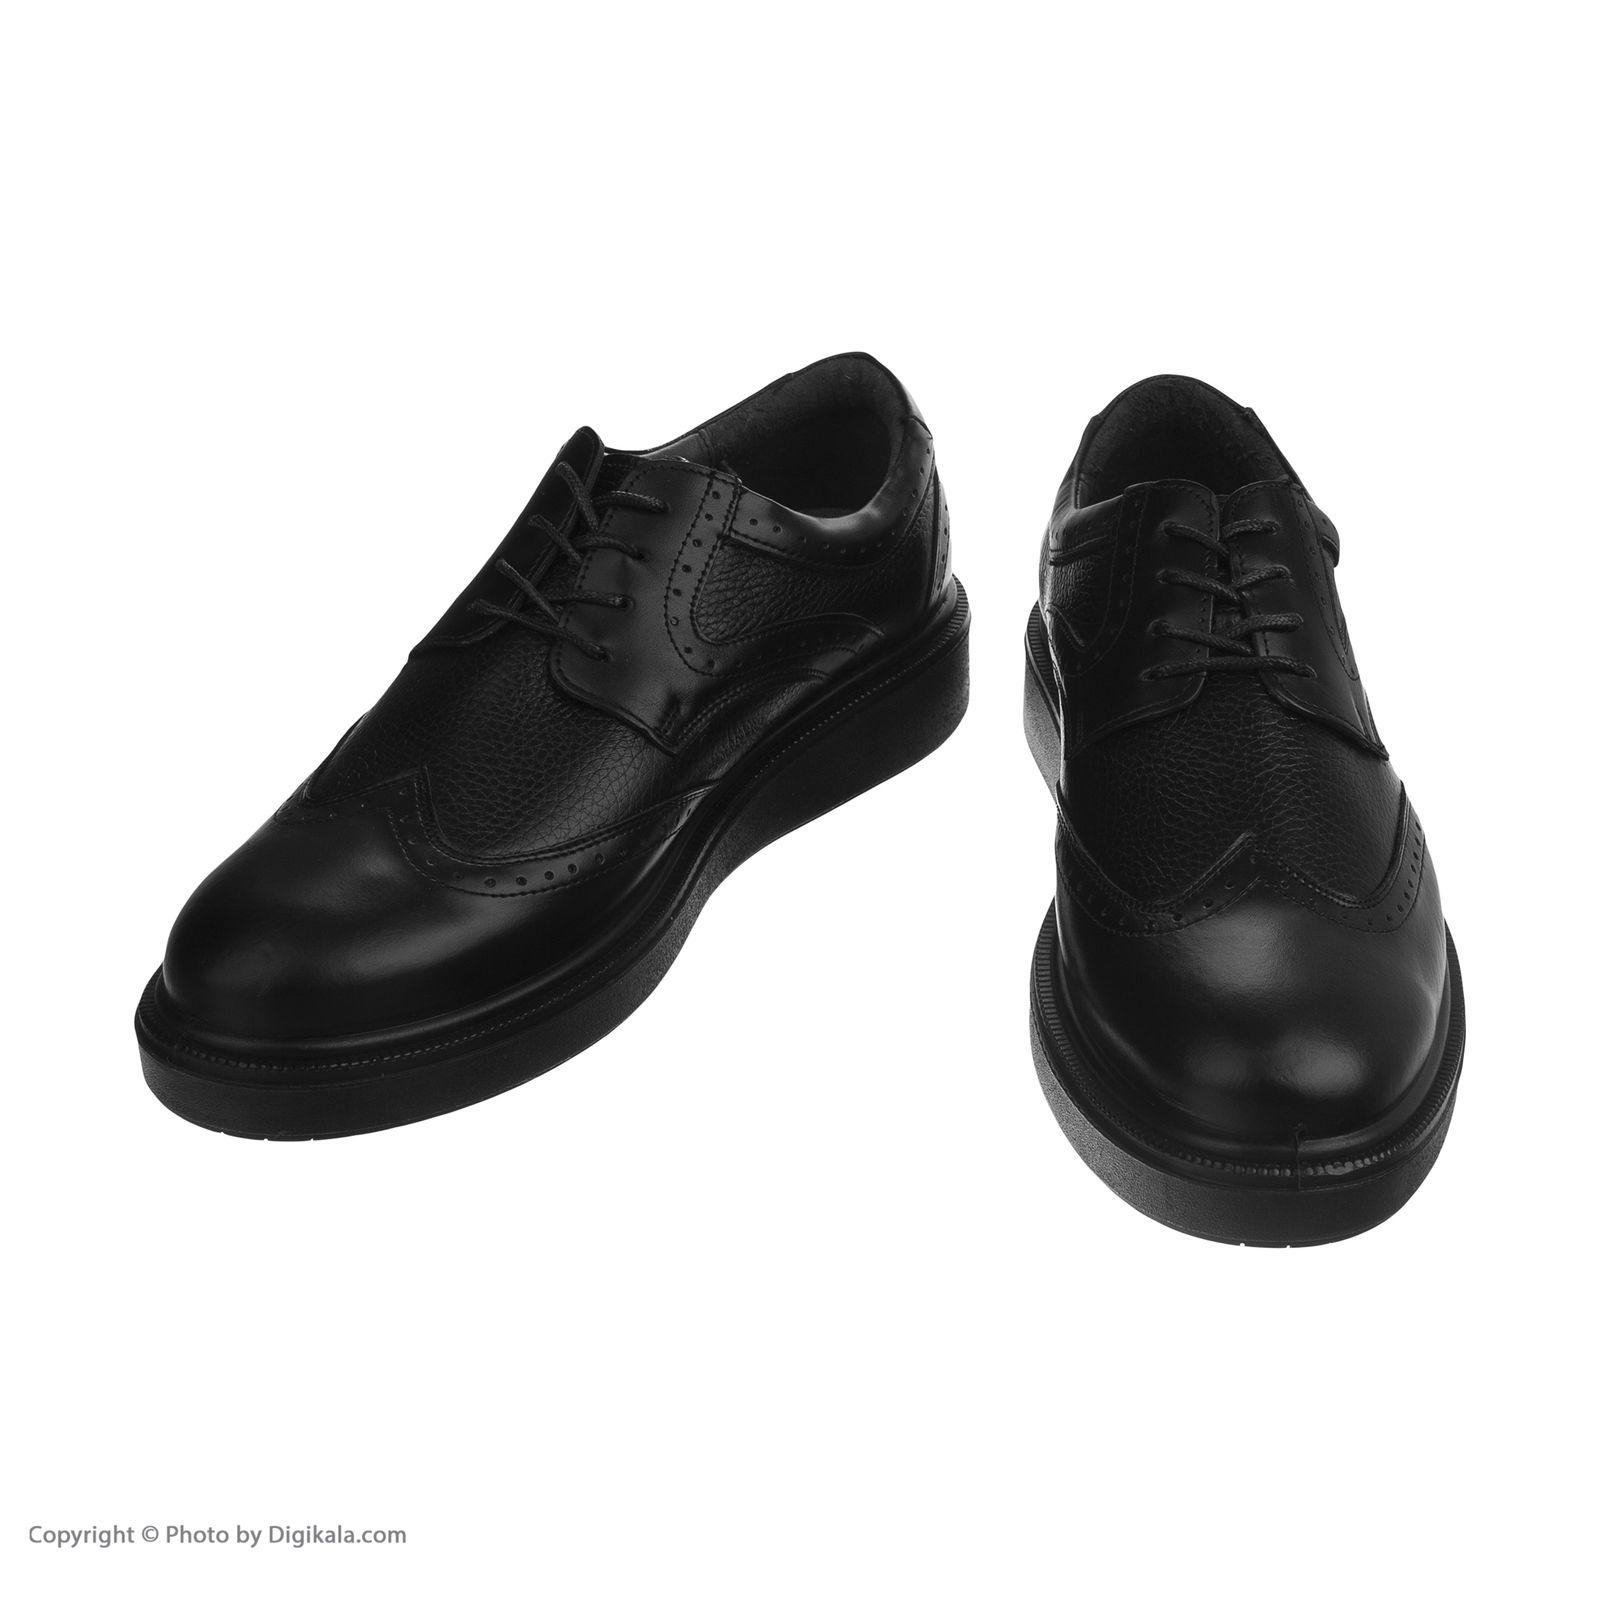 کفش روزمره مردانه آقانژاد مدل 10000-99